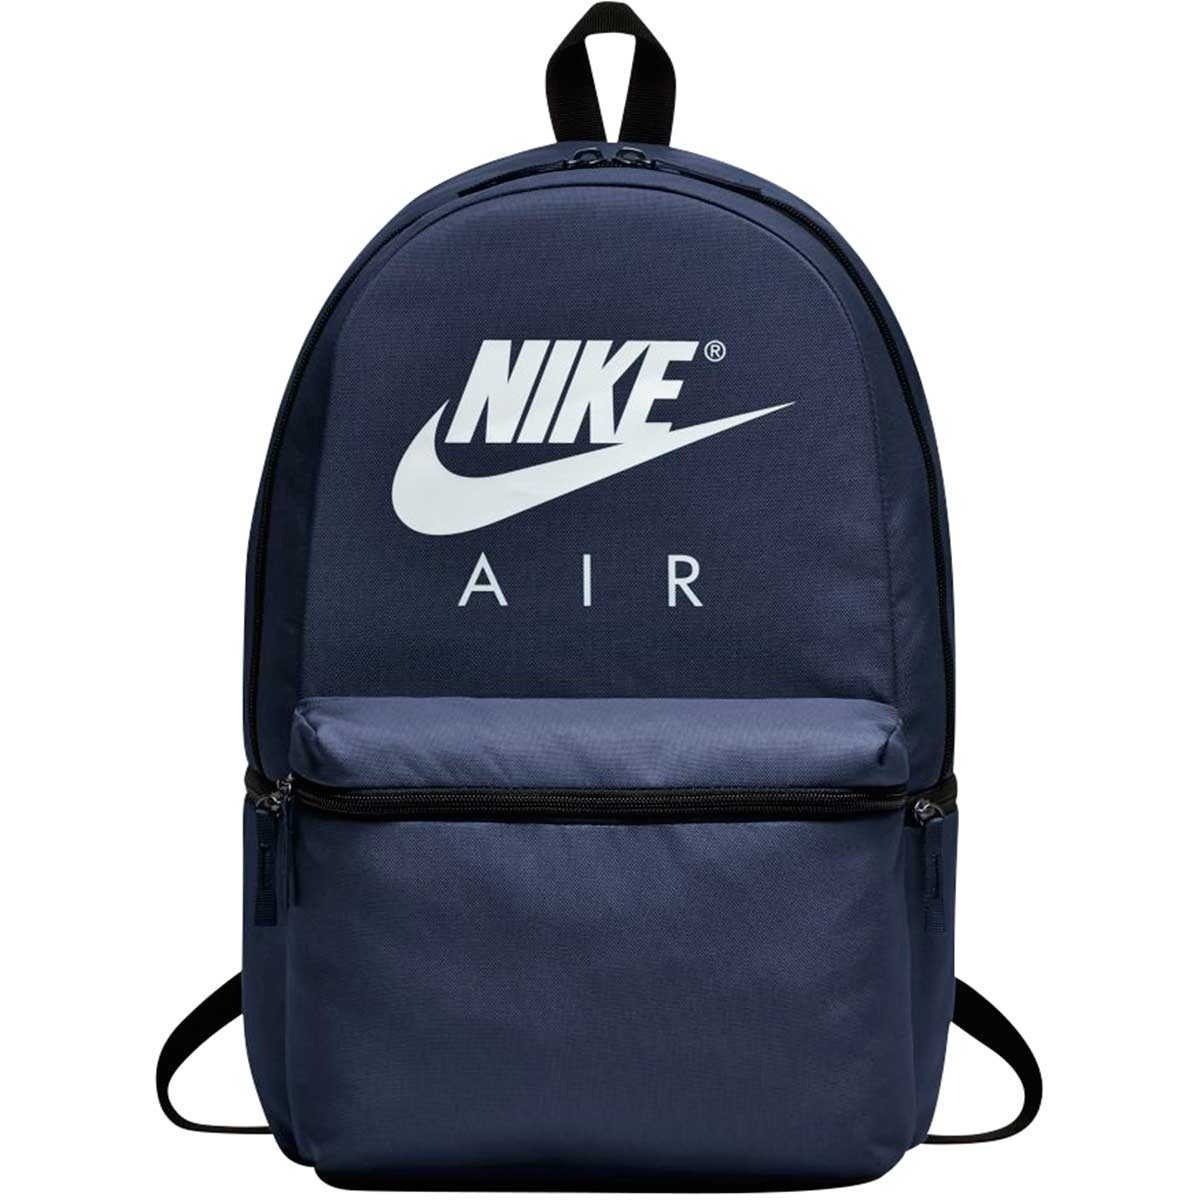 Mochila Nike Air Backpack 26 Litros Envio Gratis